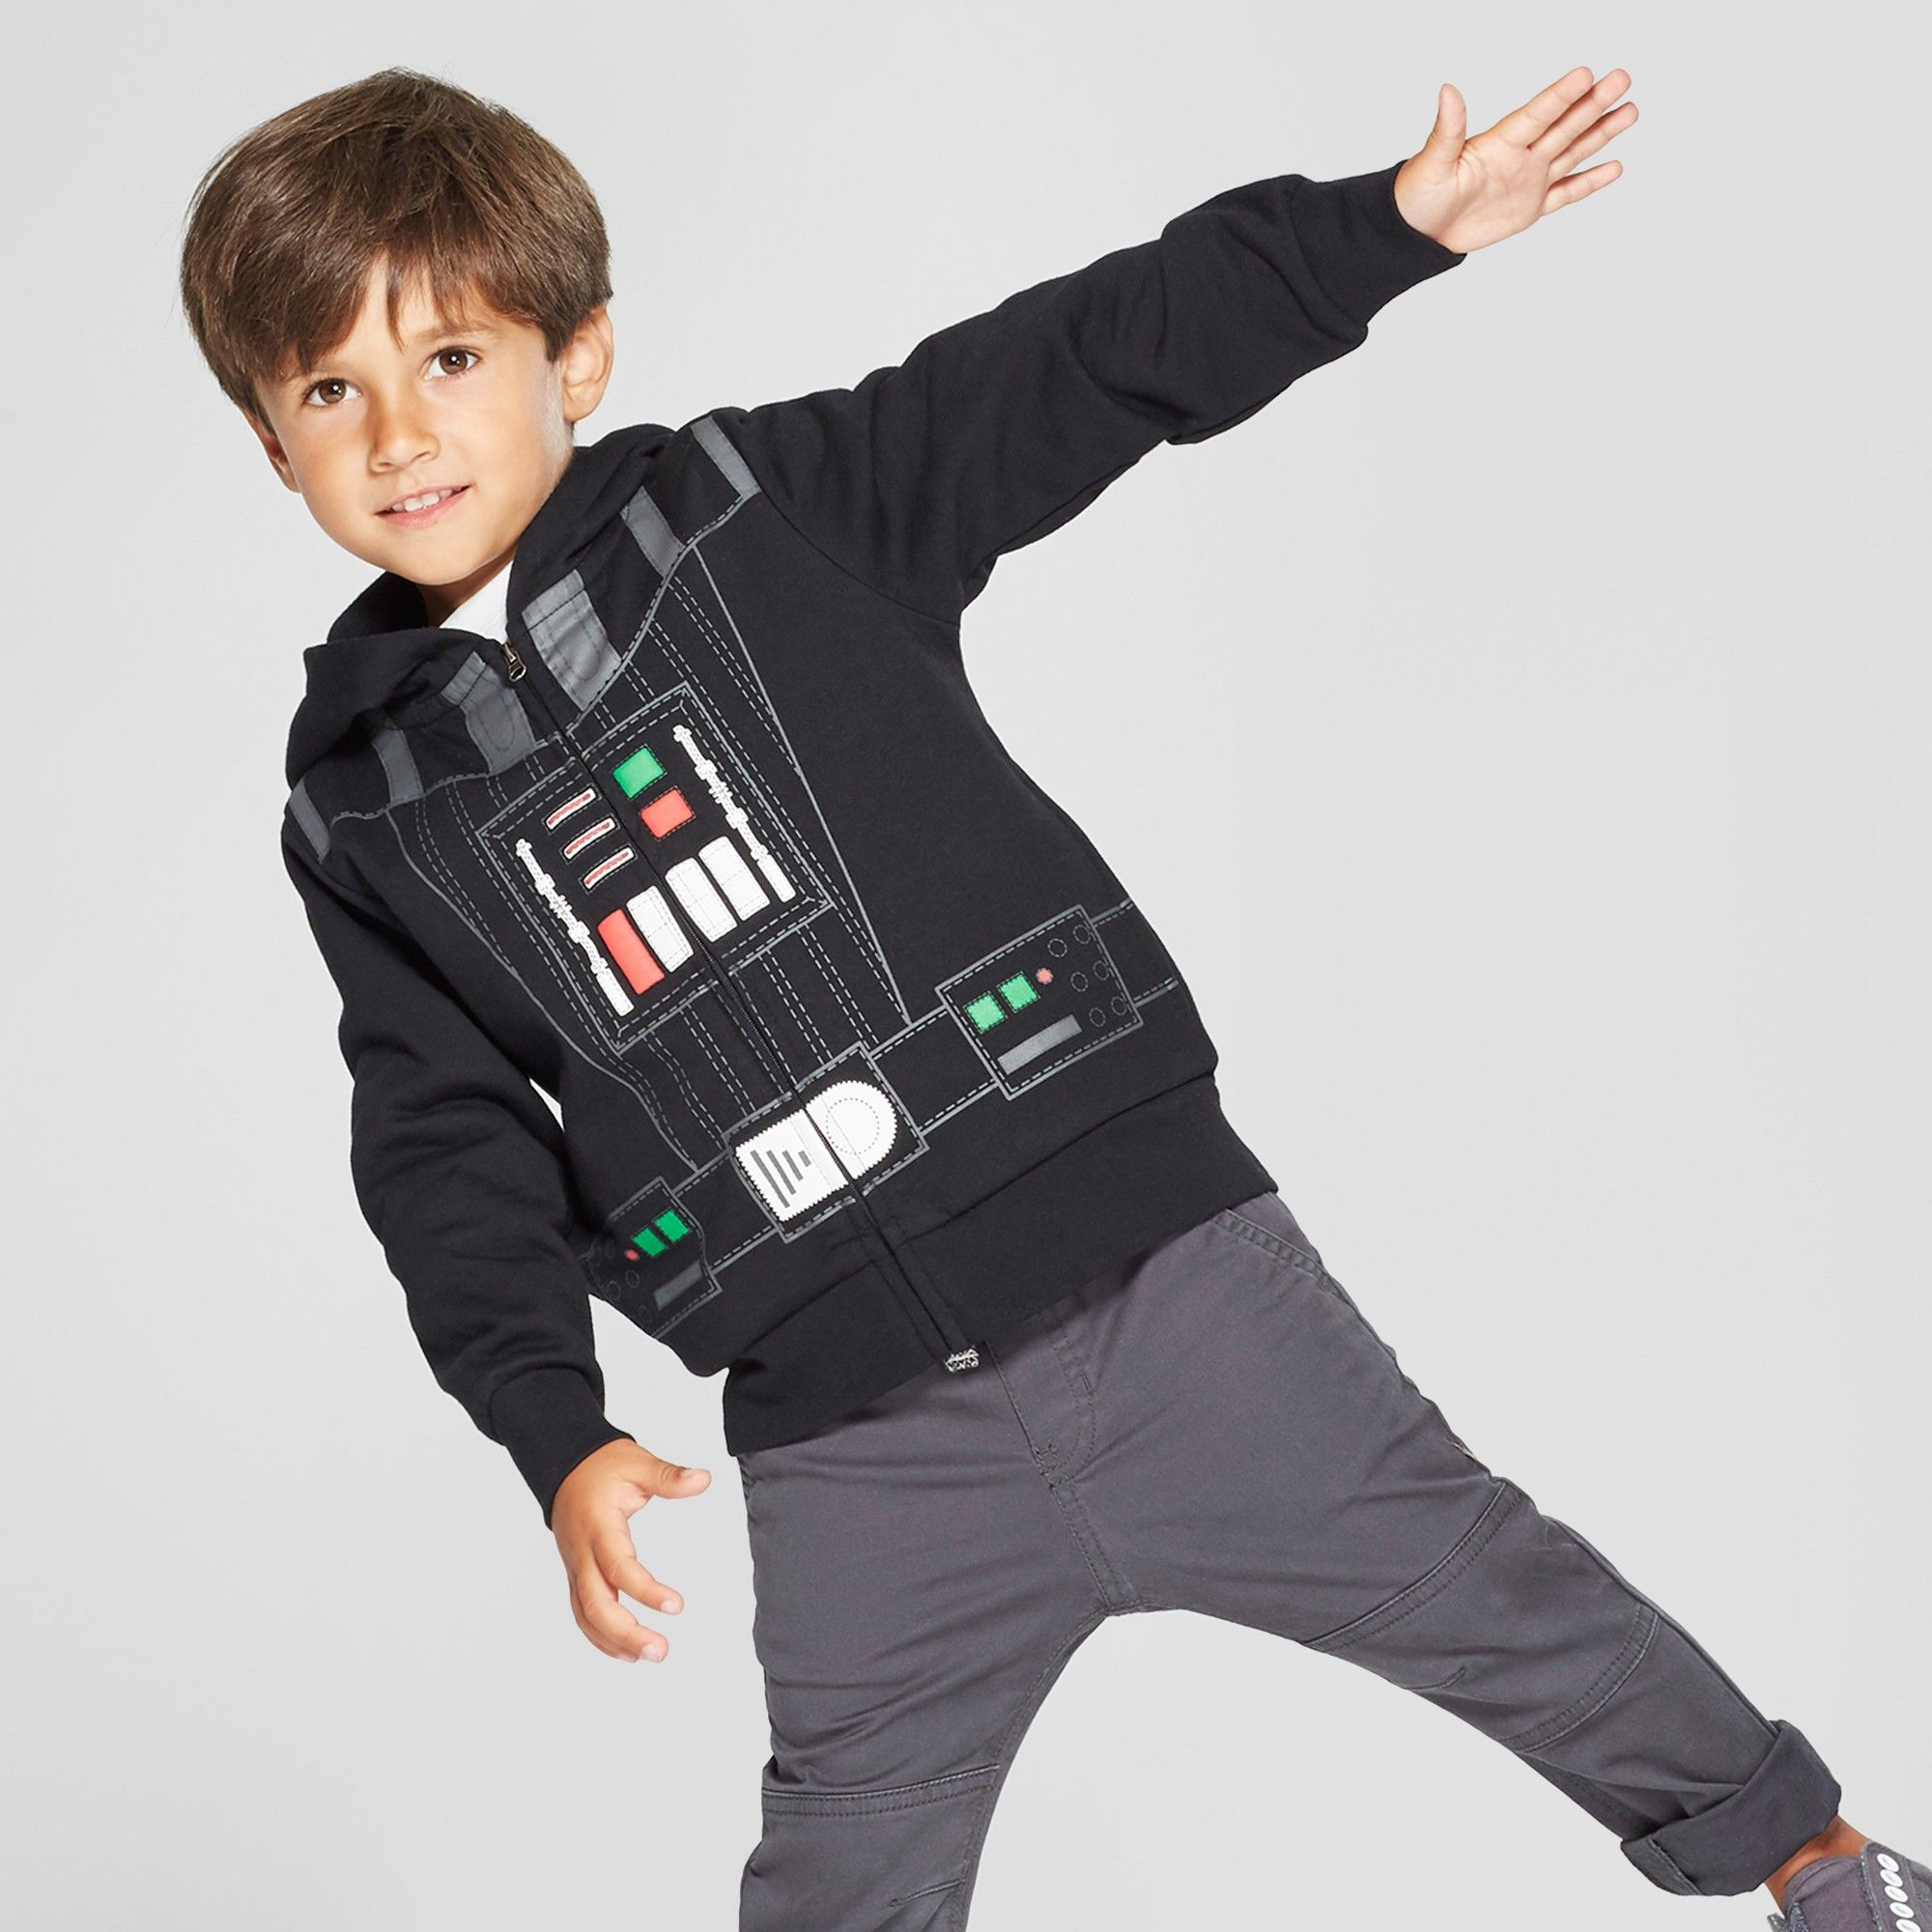 Star Wars Boys Childrens Zip Up Hoodie Darth Vader With Mask Black Sweatshirt